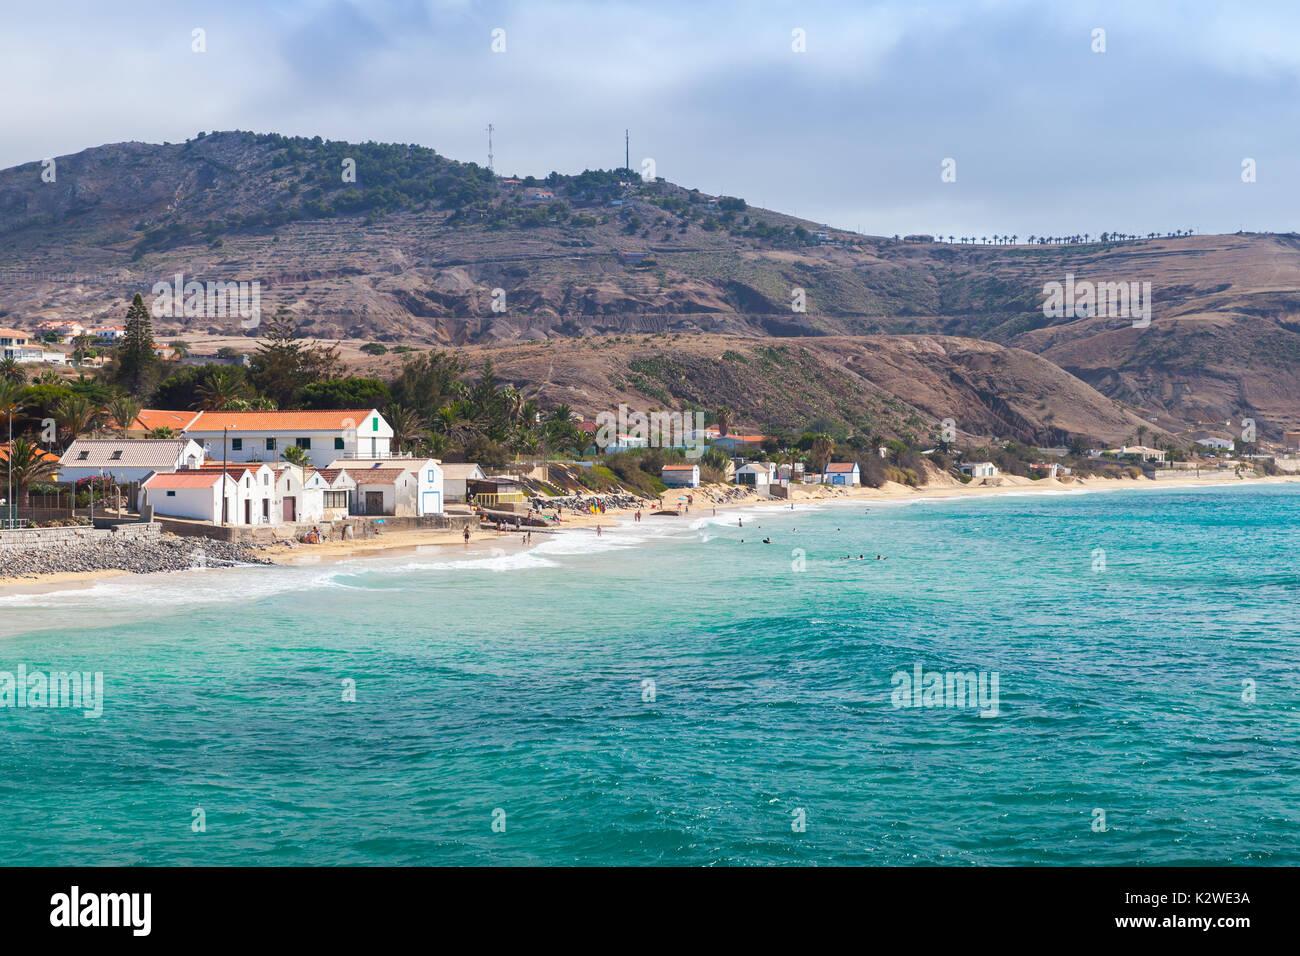 Vila Baleira. Coastal landscape of the island of Porto Santo in the Madeira archipelago - Stock Image